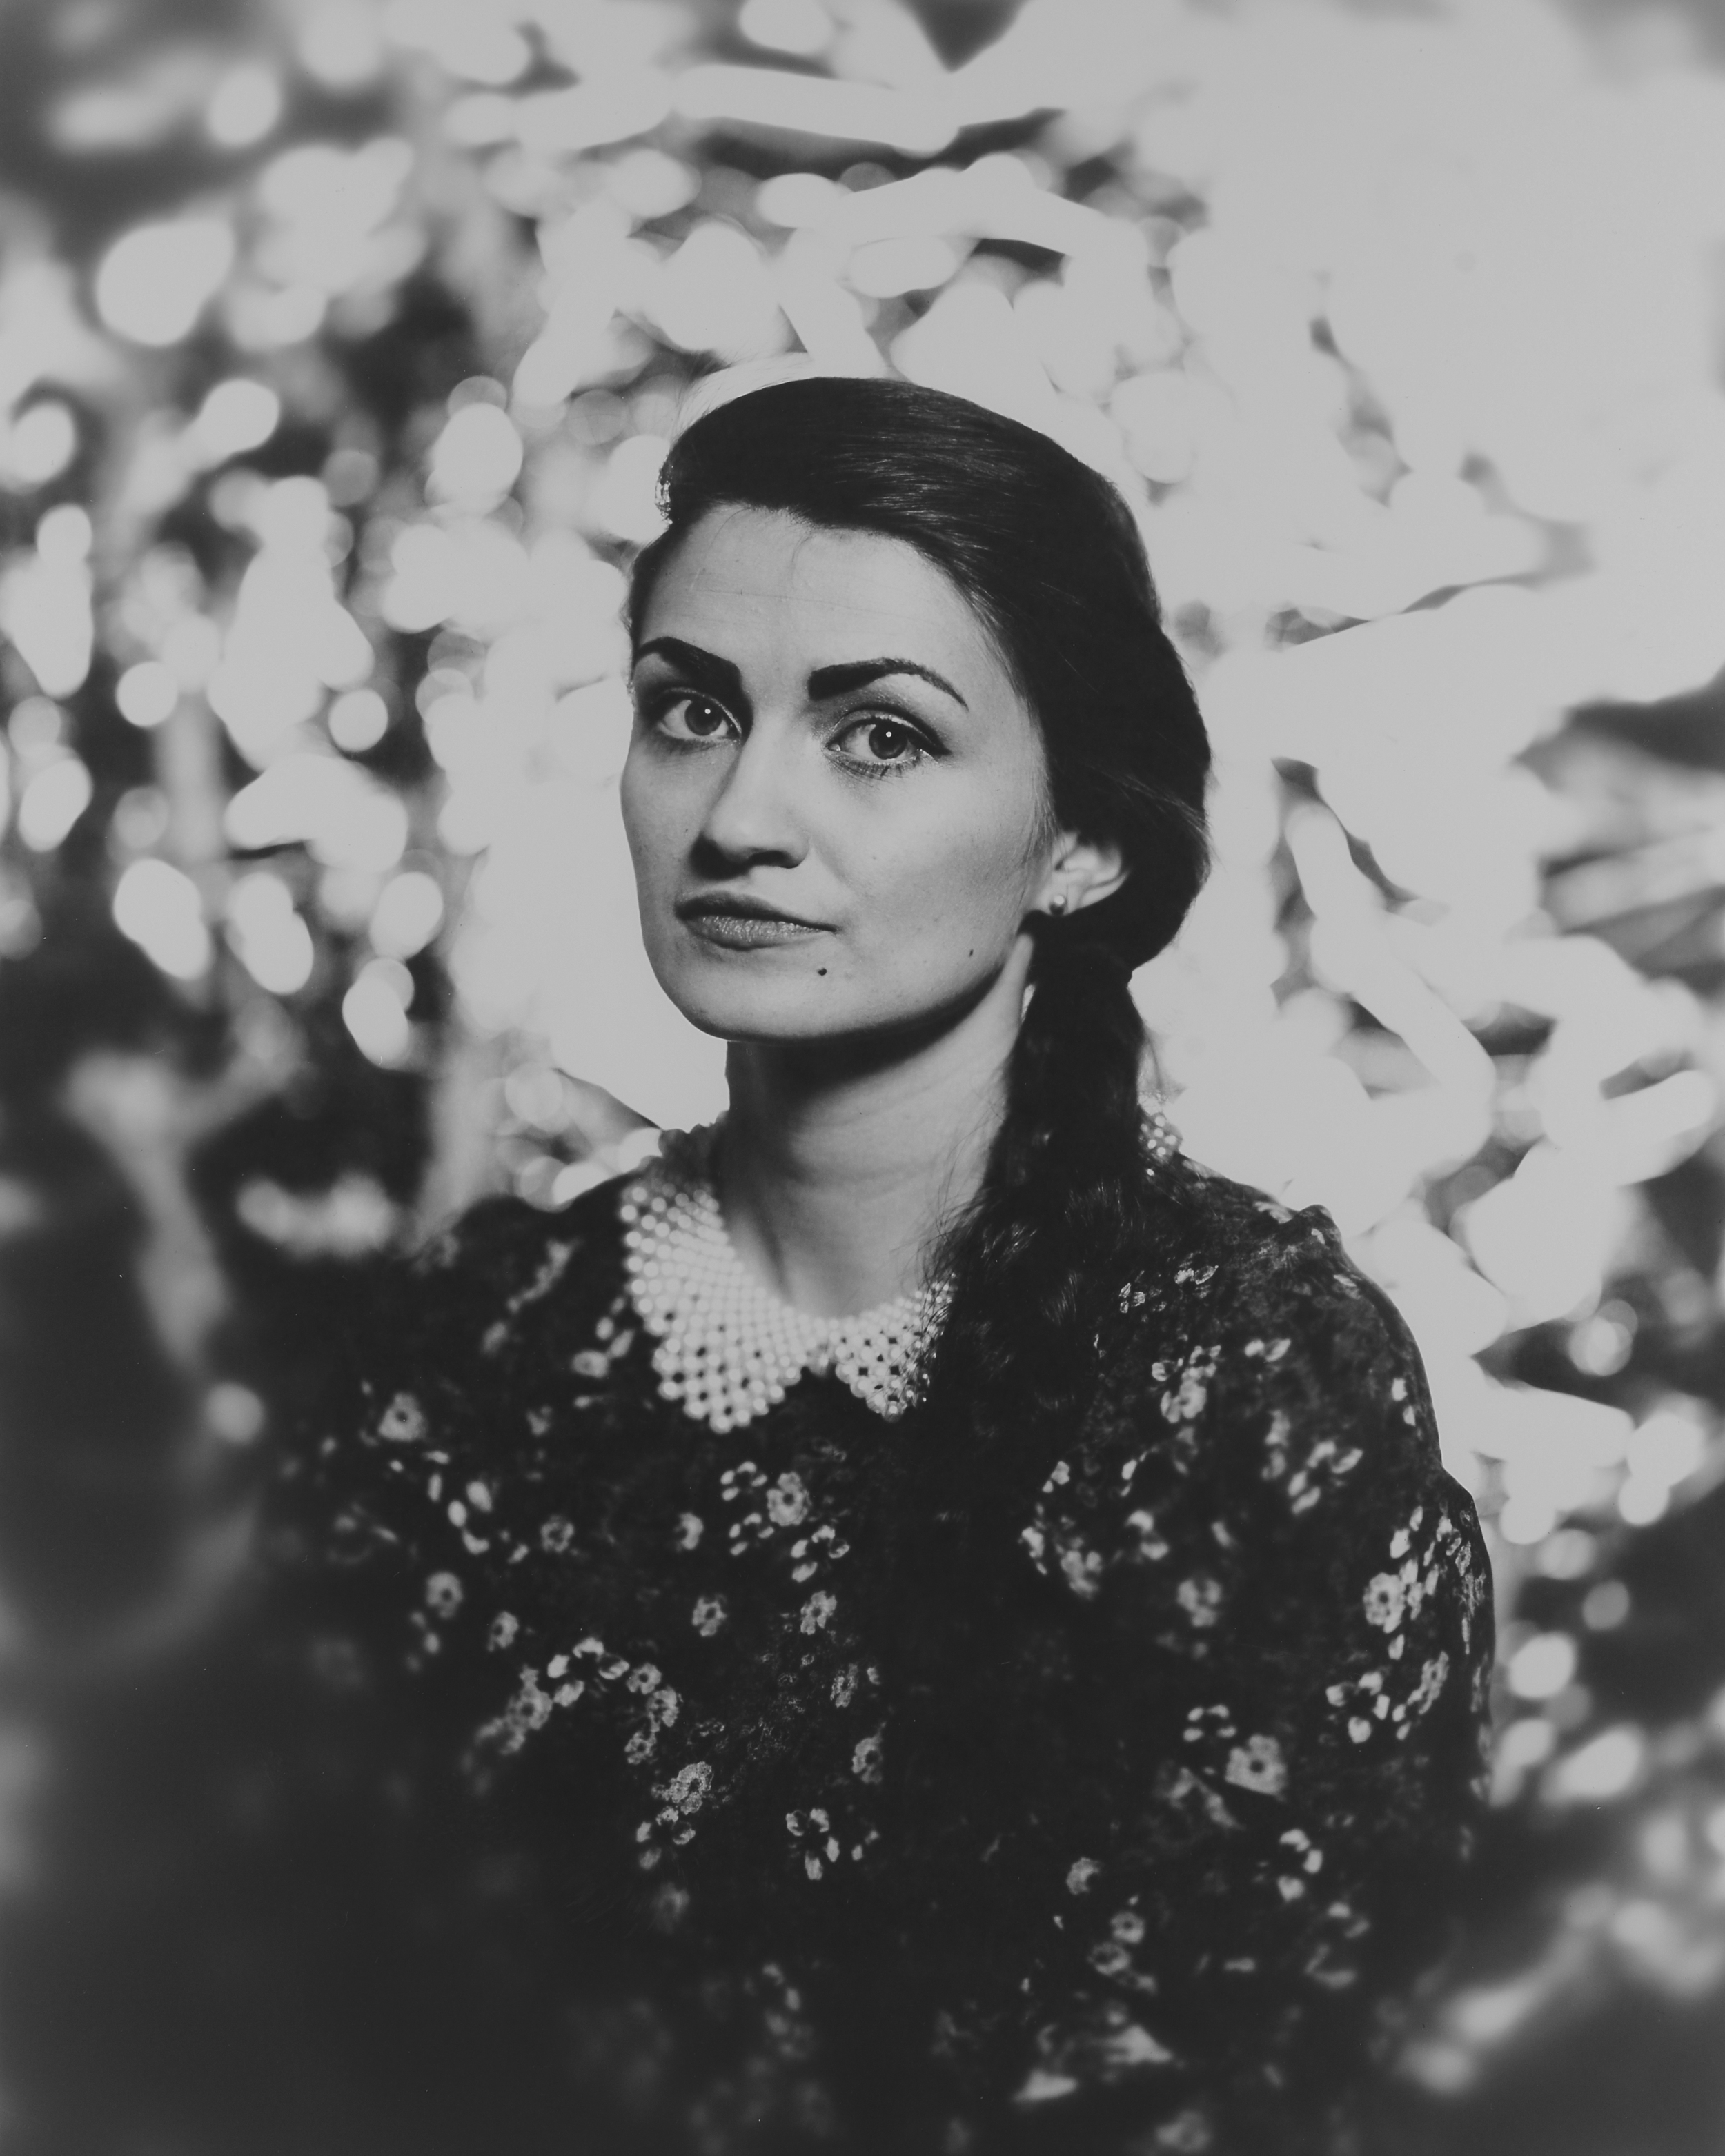 Sanja Lukac